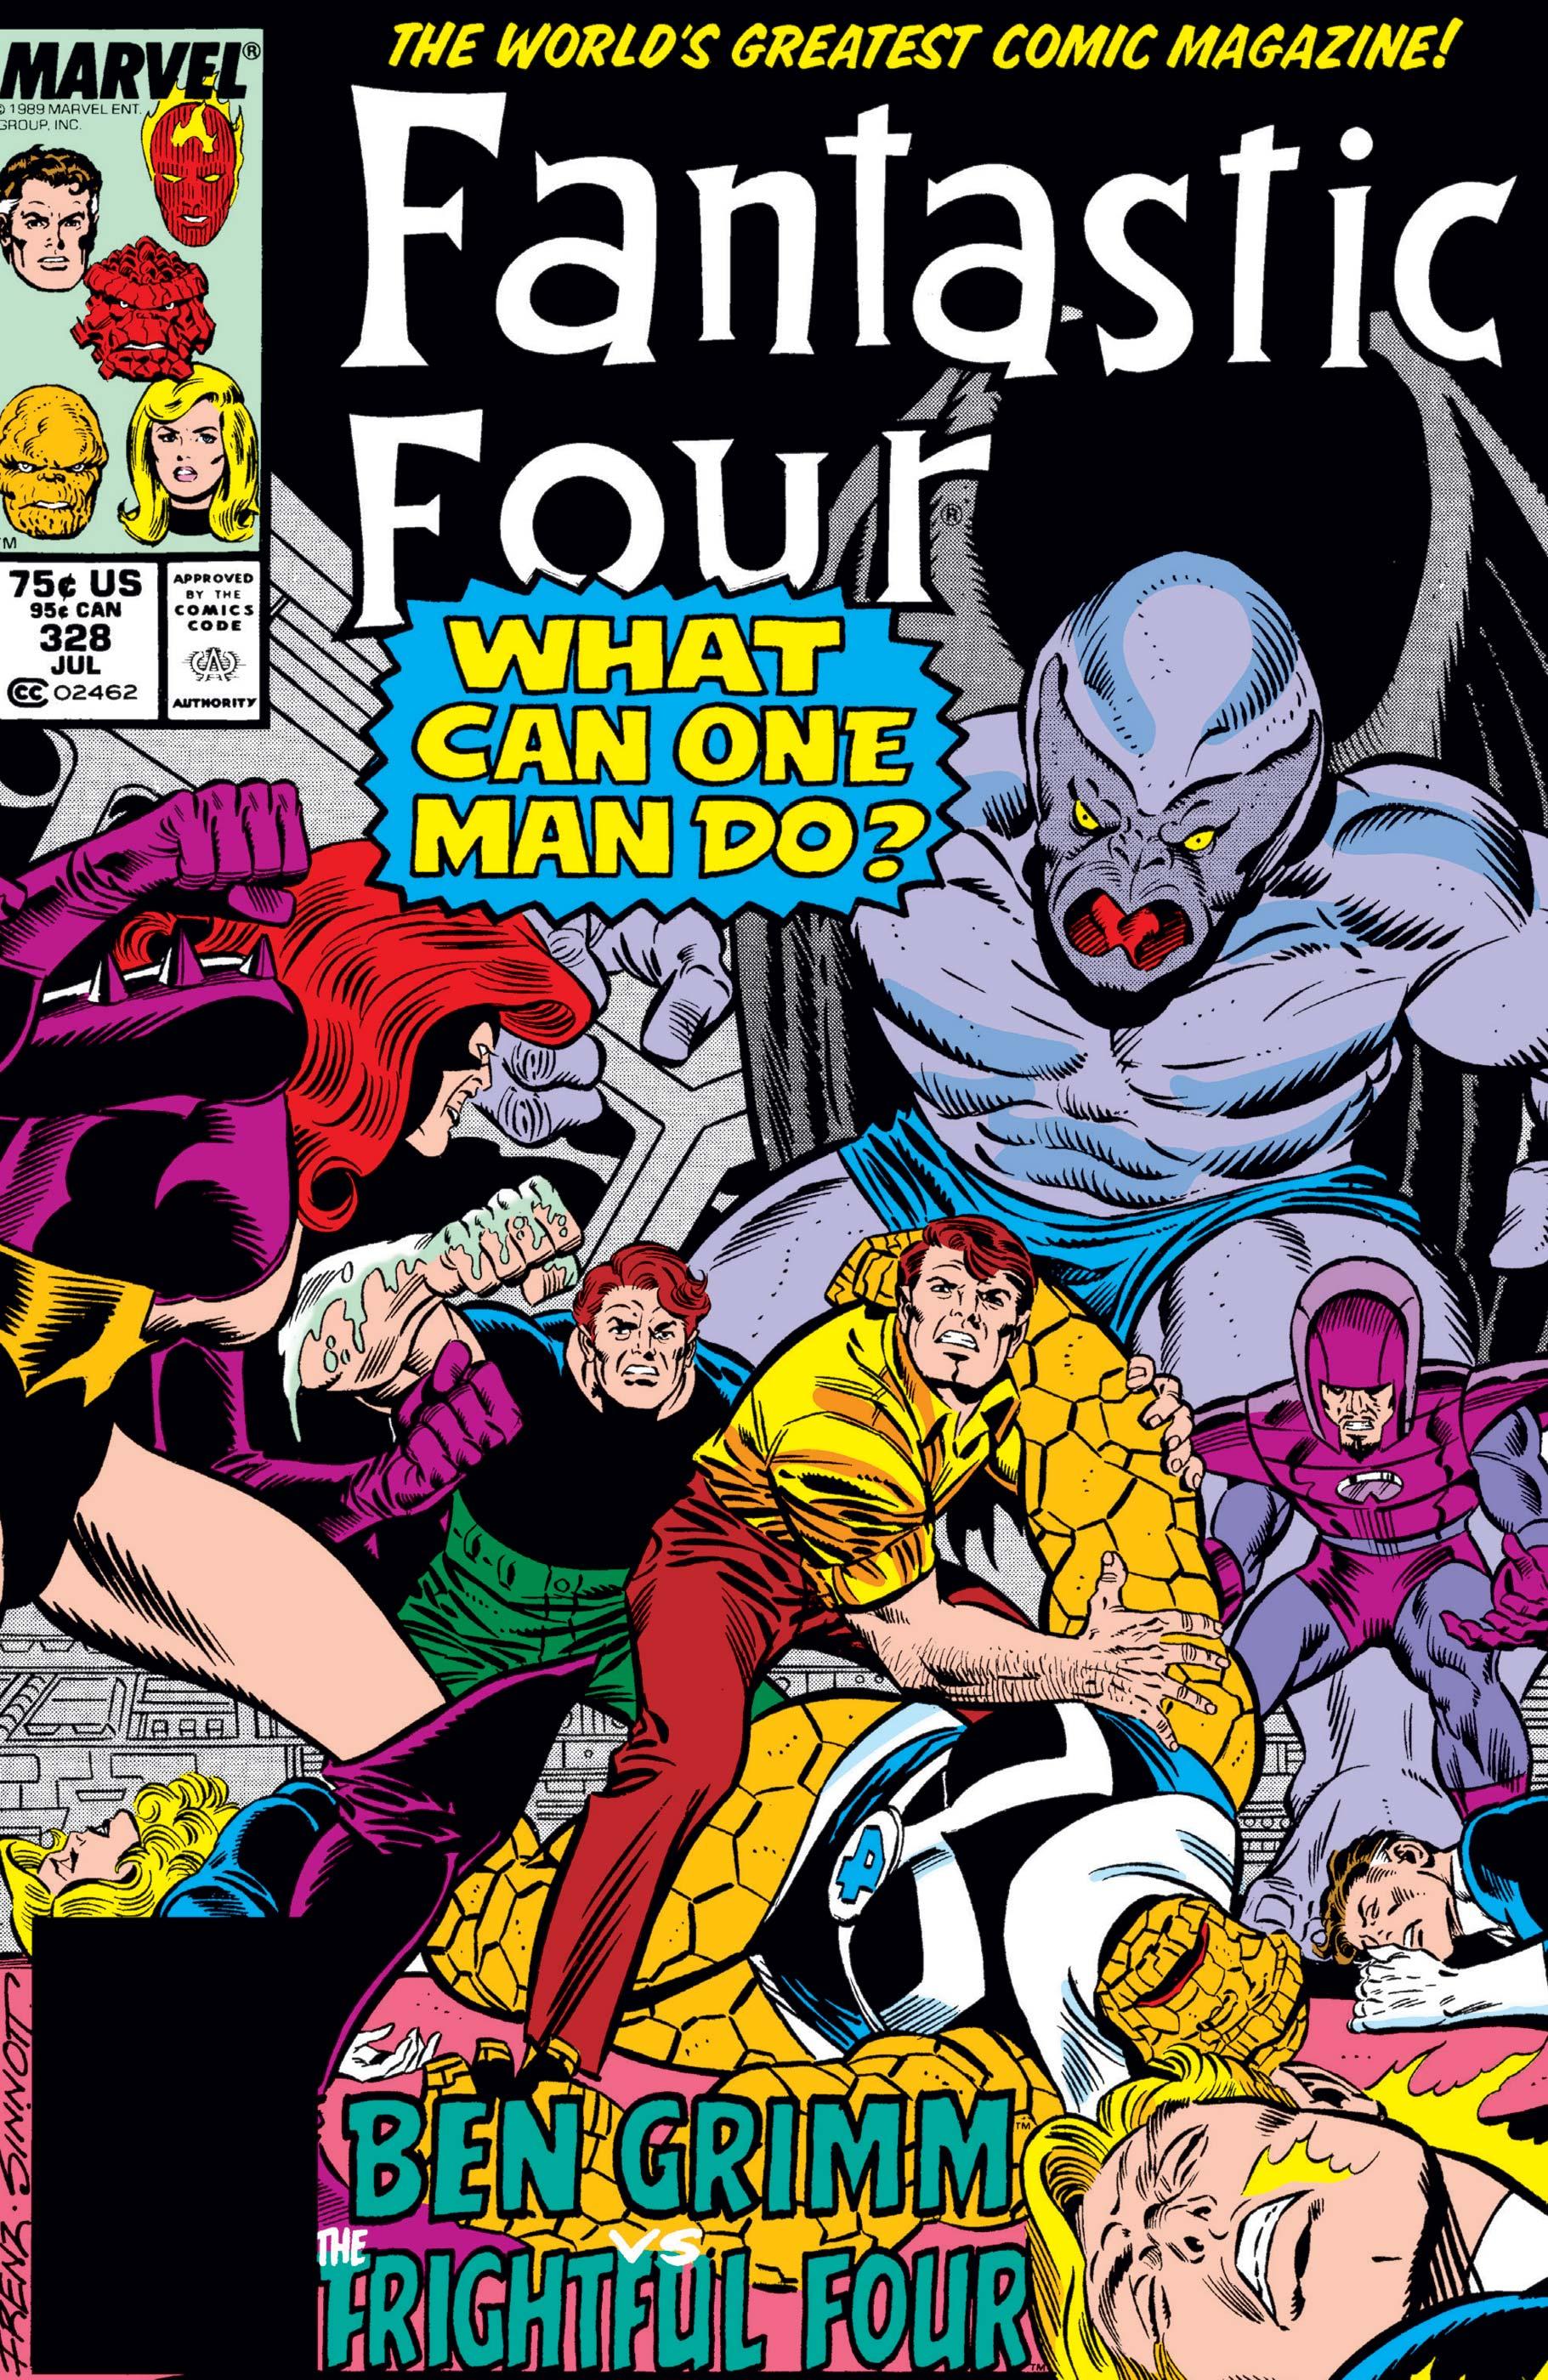 Fantastic Four (1961) #328